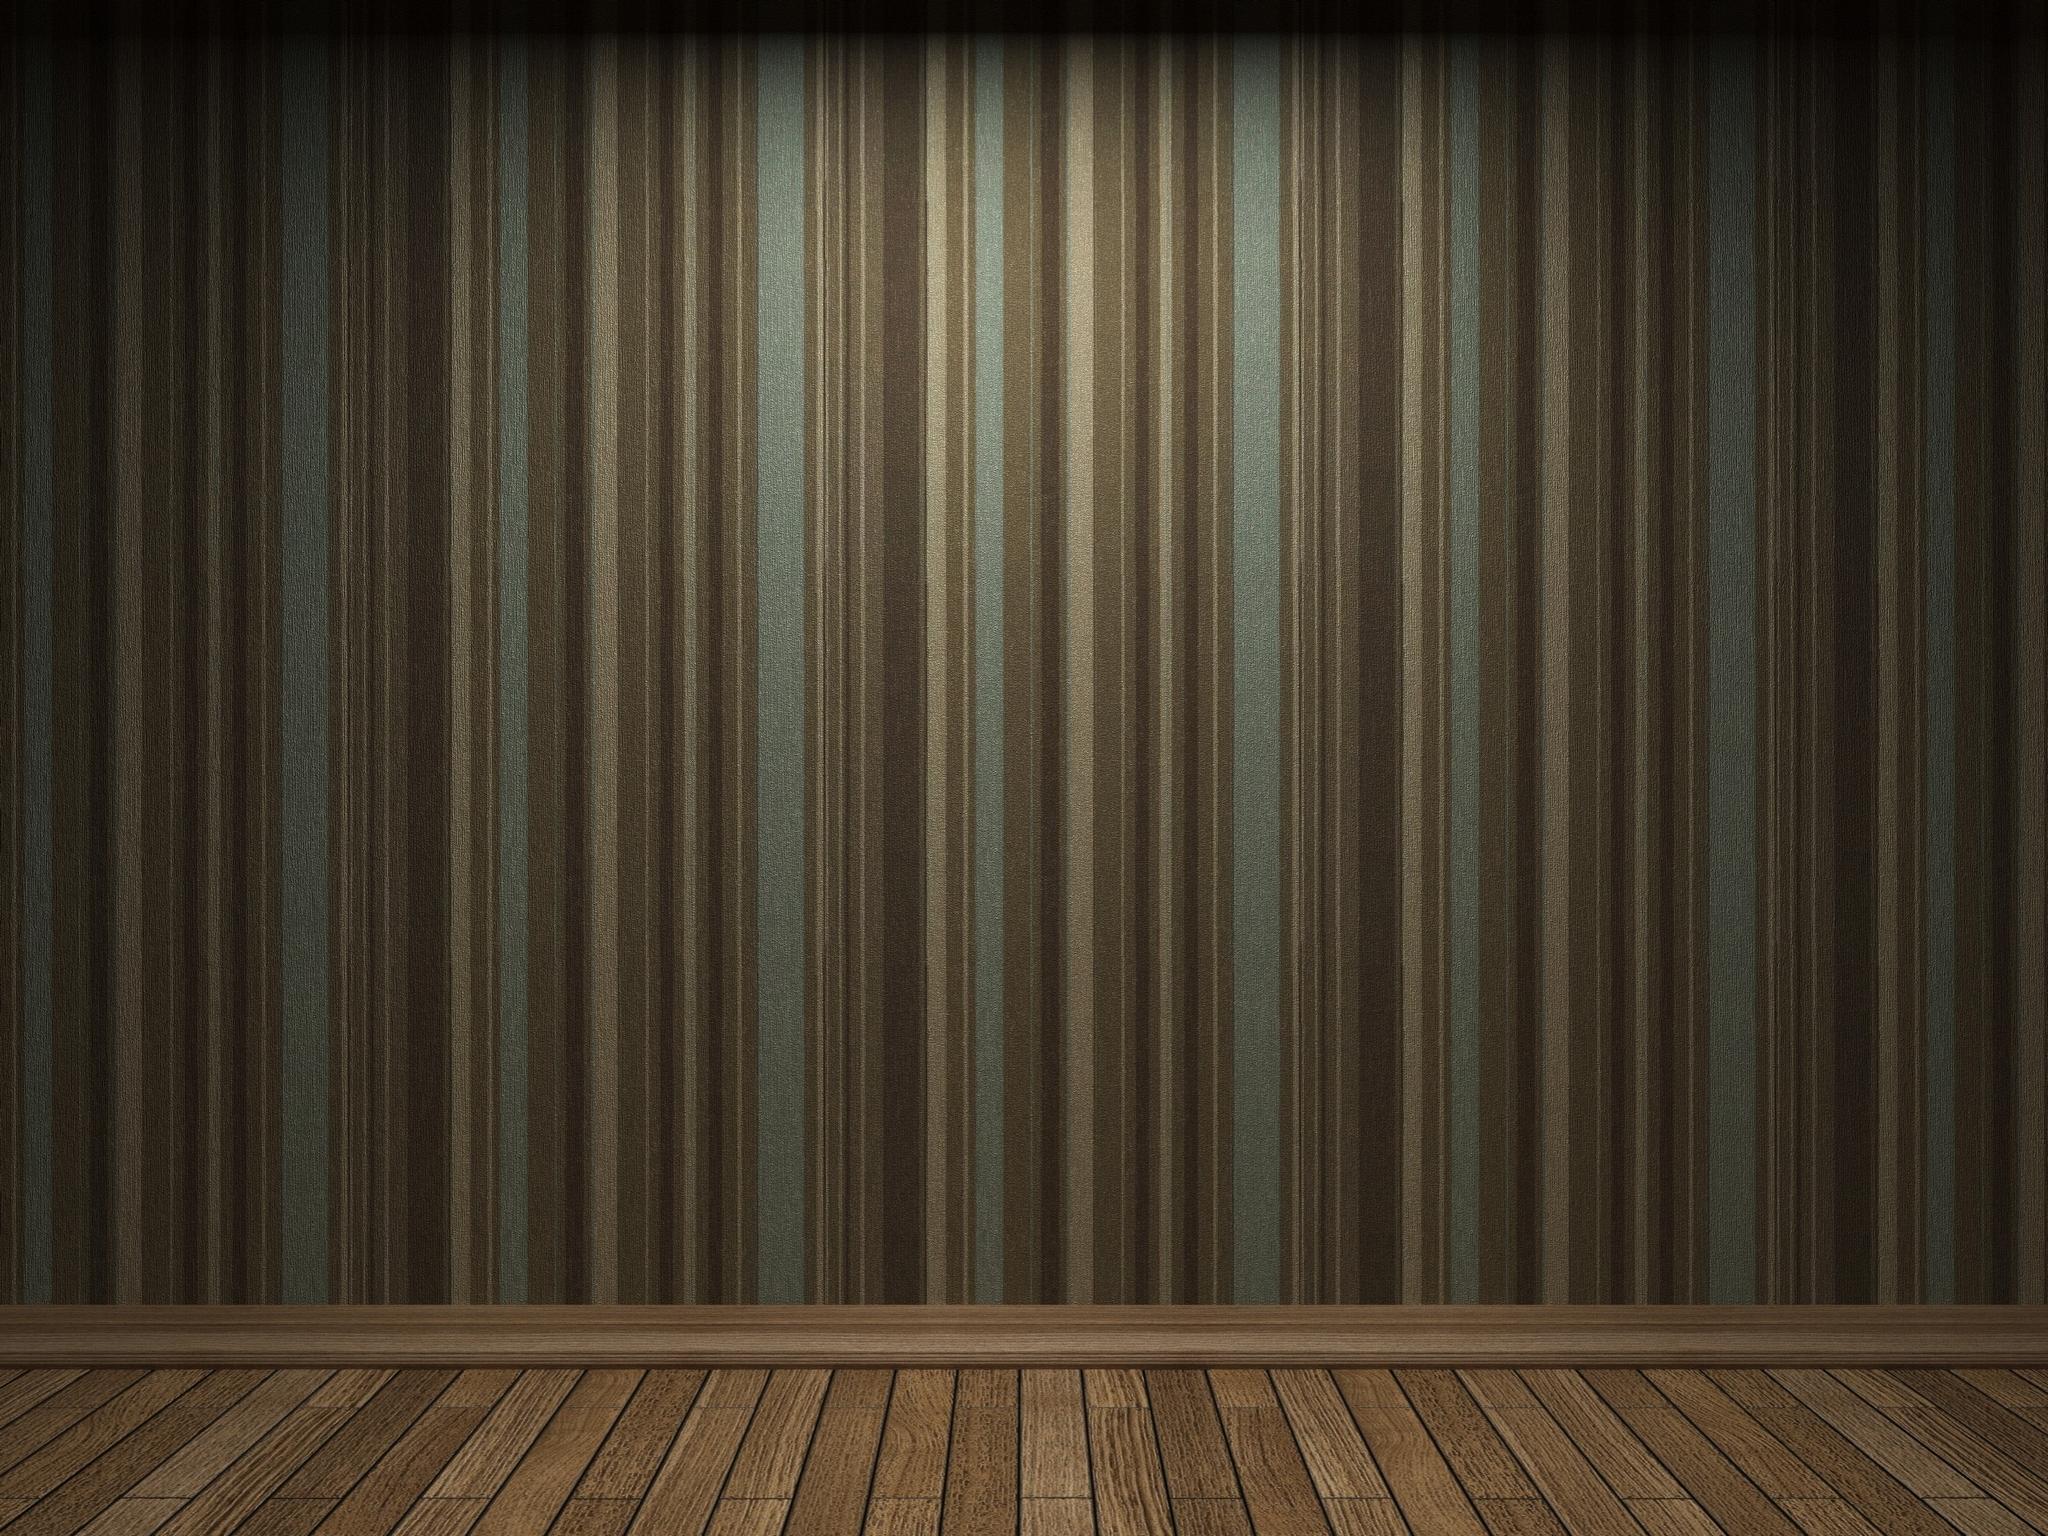 49 Wall Wallpaper Designs Gallery On Wallpapersafari